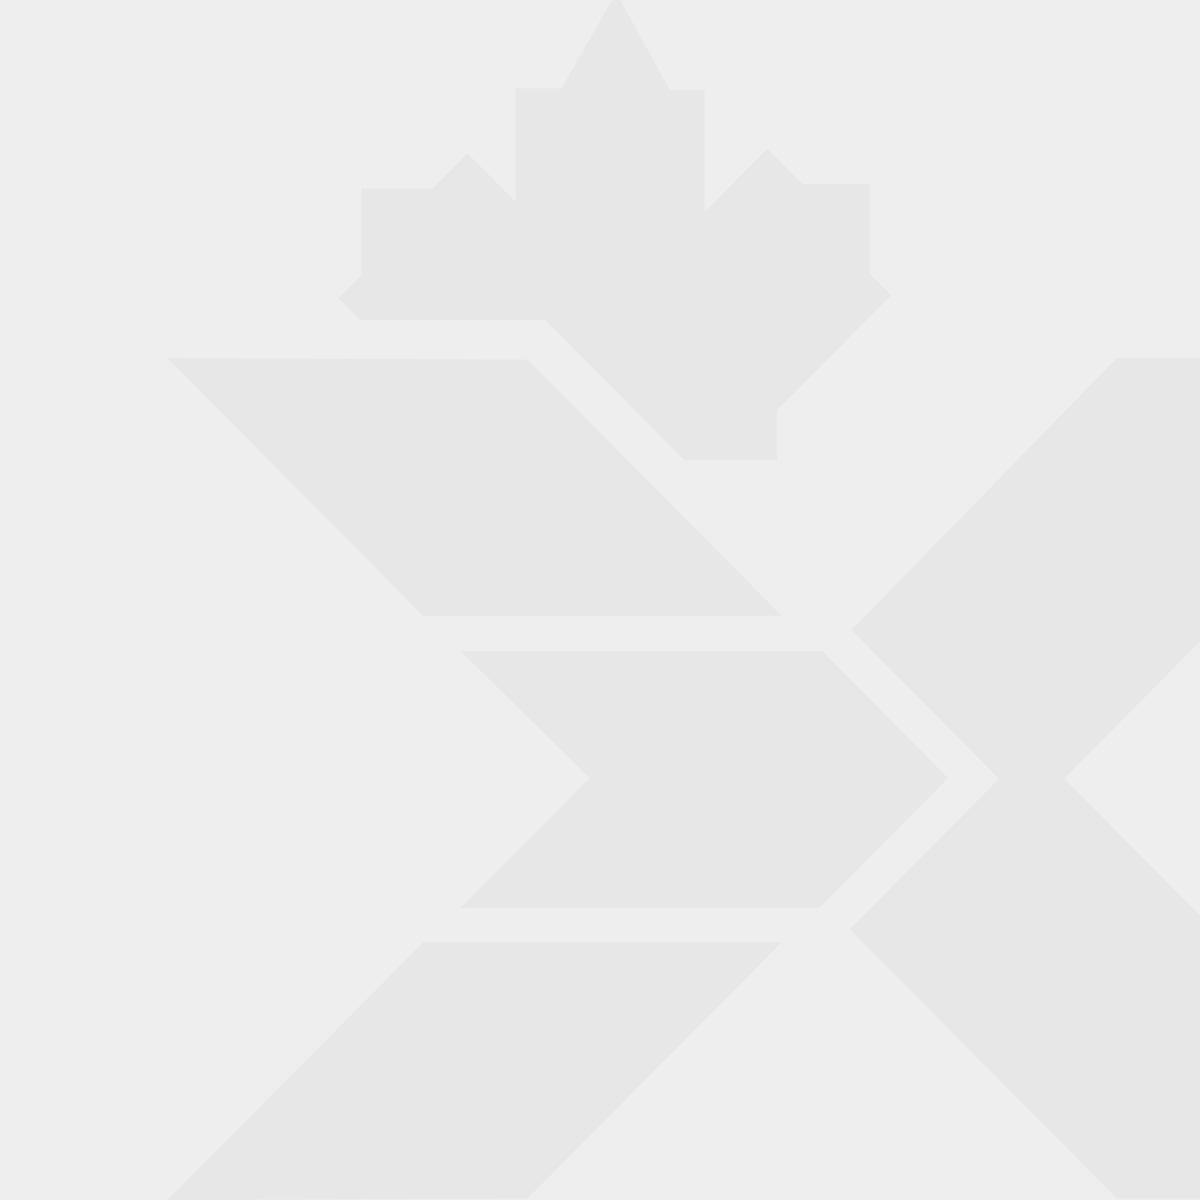 5th Canadian Division HQ Lapel Pin